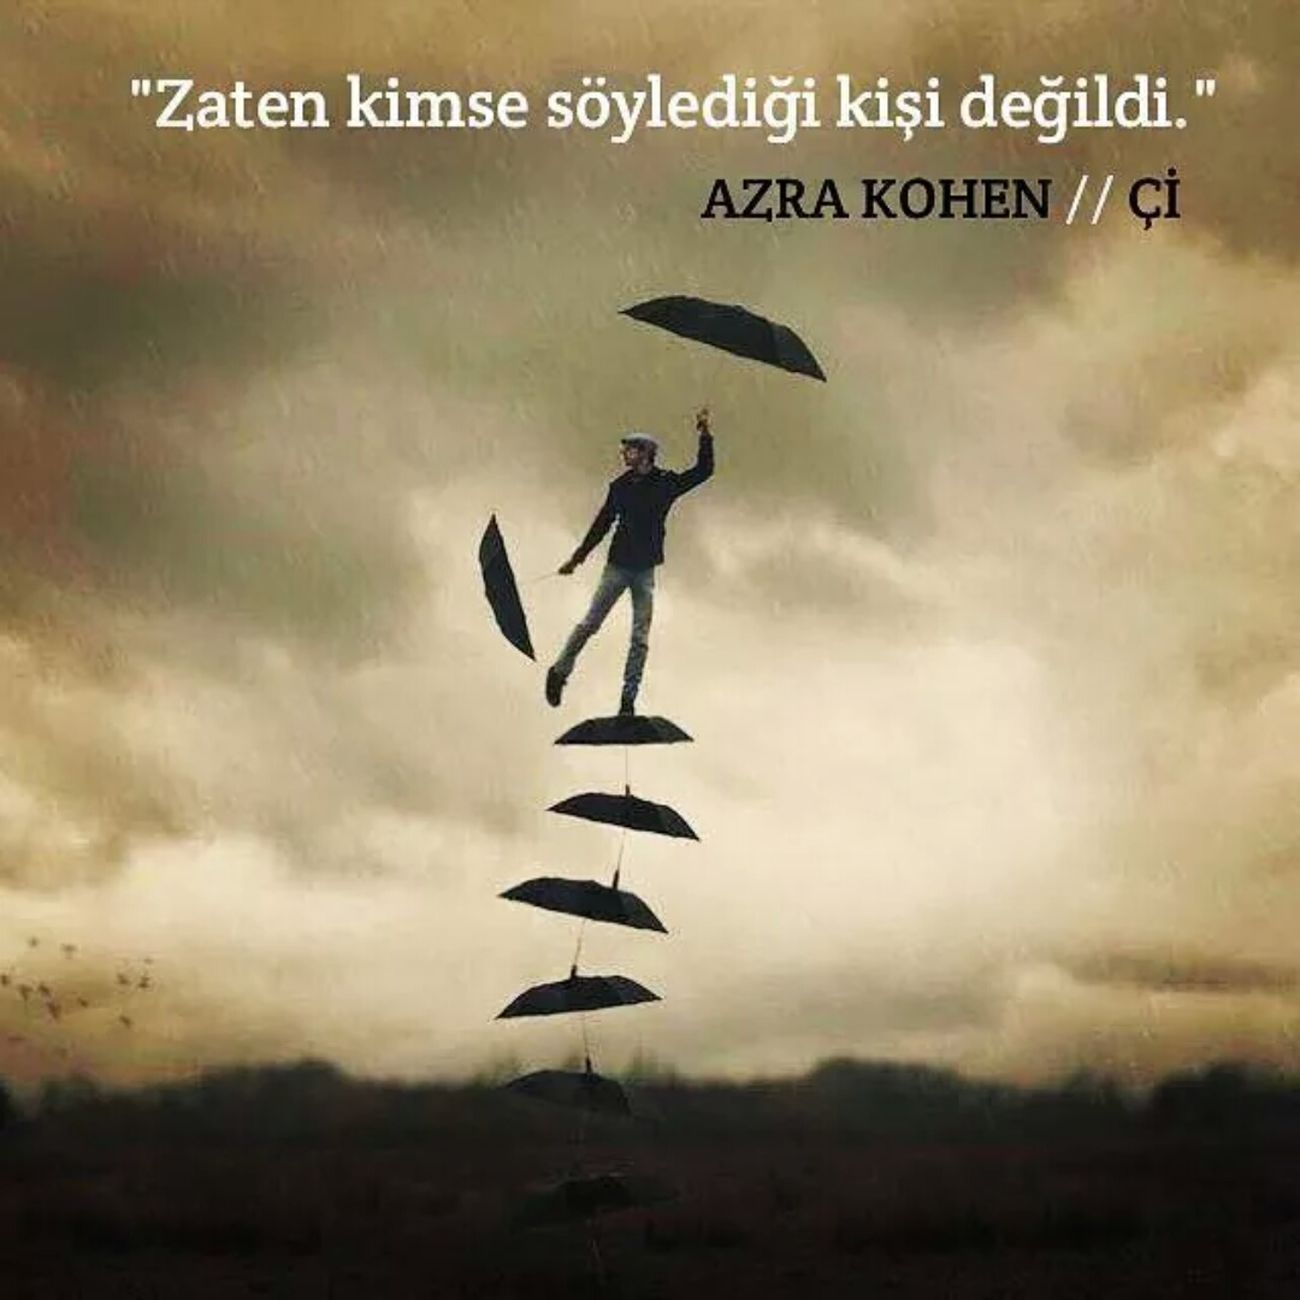 Bugün de böle... Hiçkimse ! Nobody Azrakohen EyeEm Turkey Hello World Mondaymorning Goodmorning